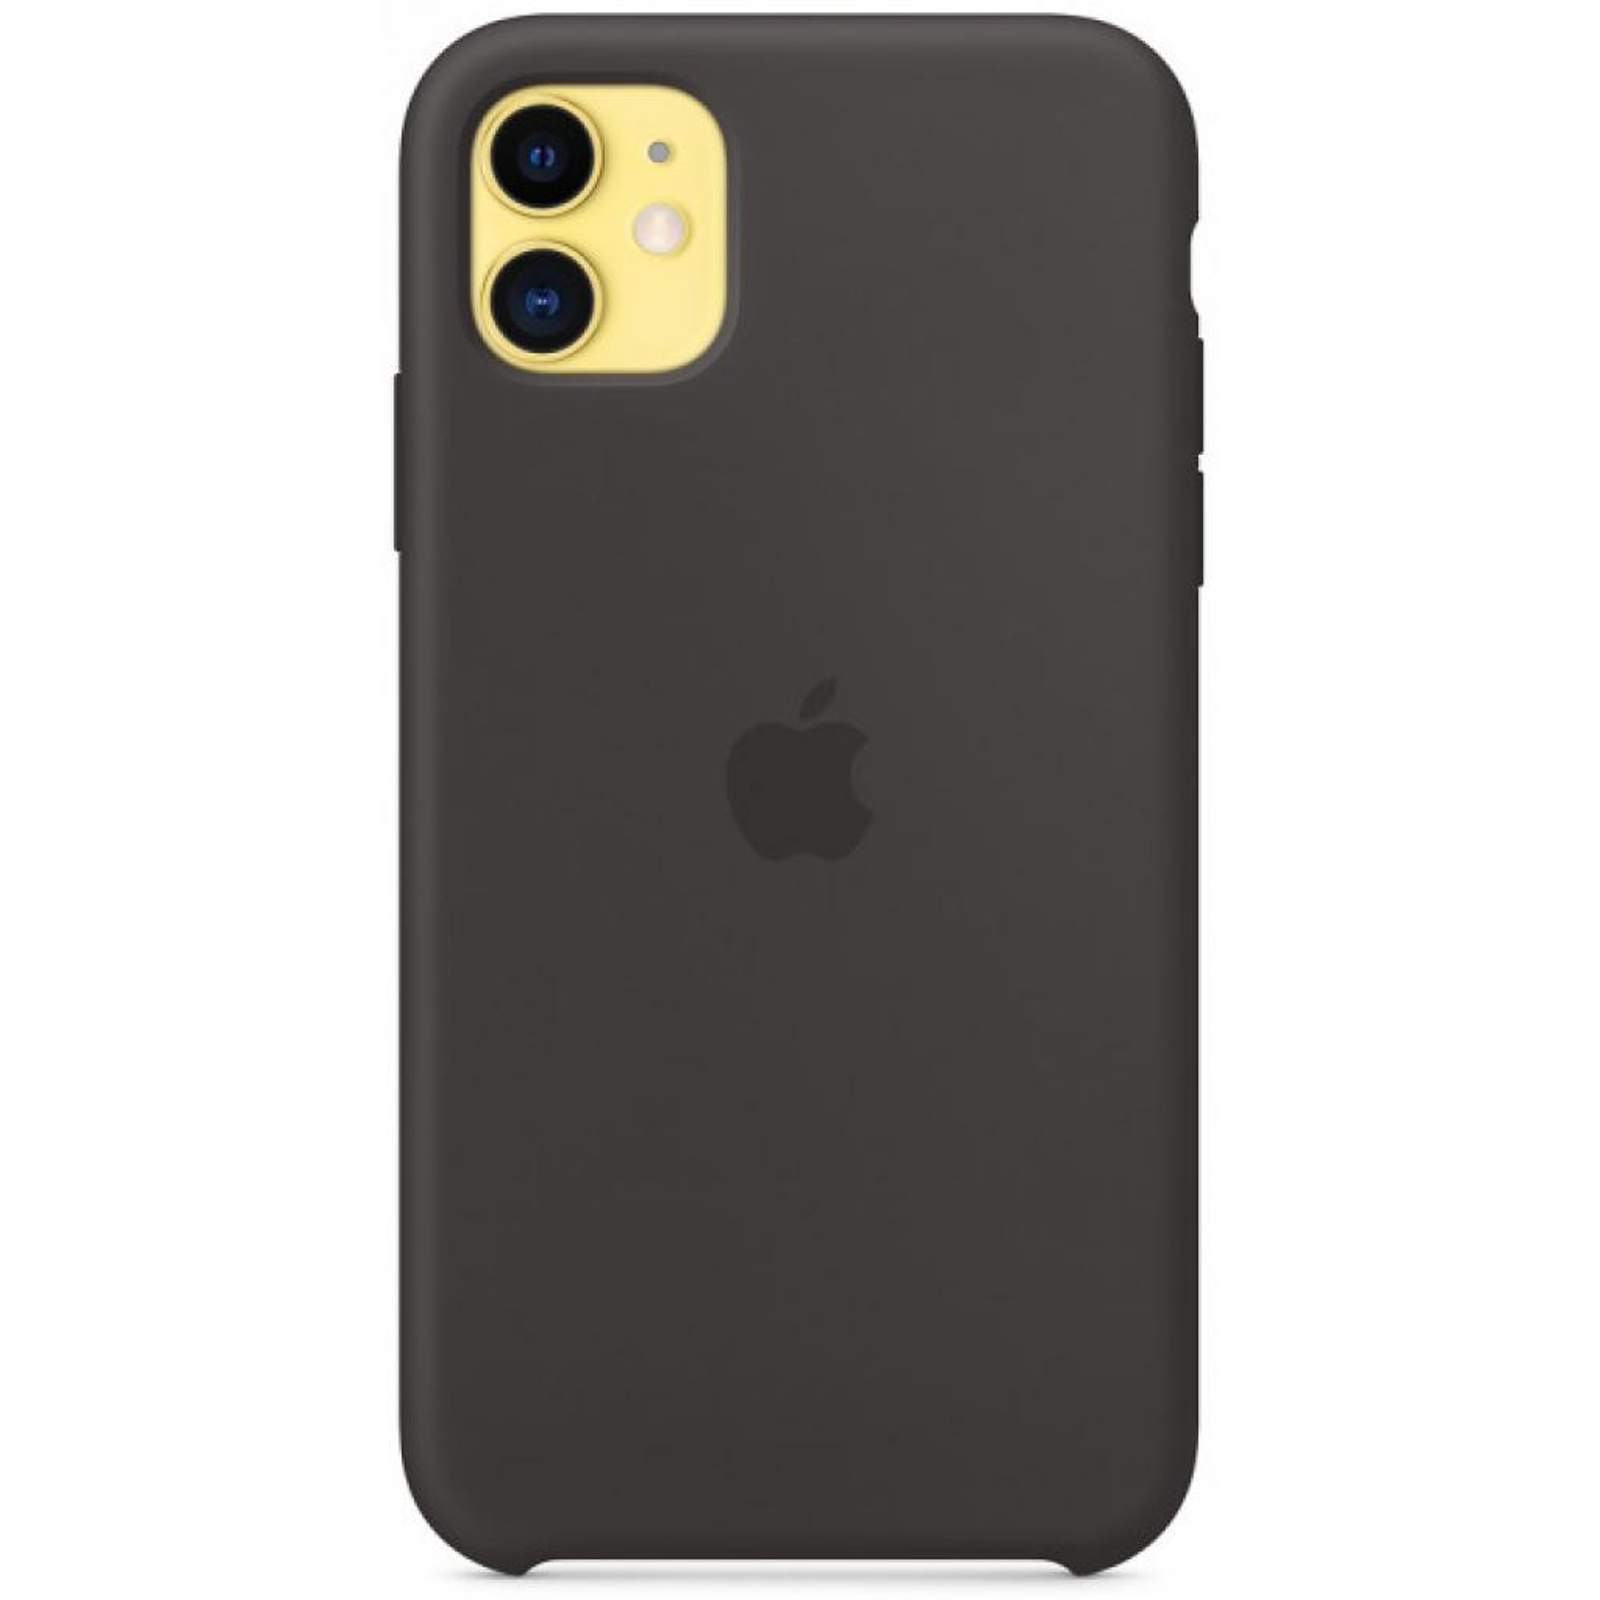 Чехол для моб. телефона Apple iPhone 11 Silicone Case - Black (MWVU2ZM/A) изображение 4